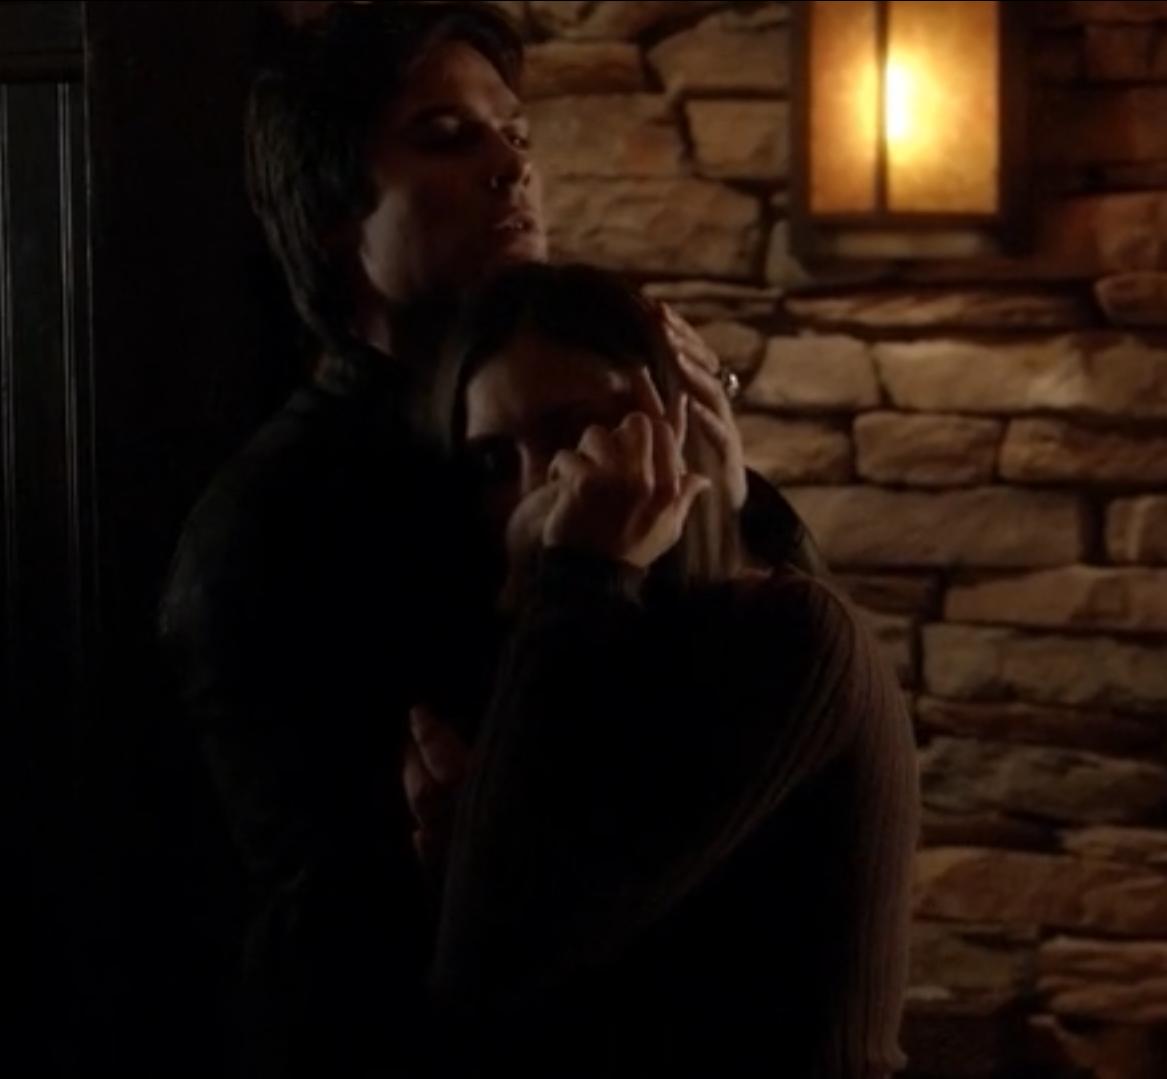 The Vampire diaries S04E02 - Scène hot Damon Elena